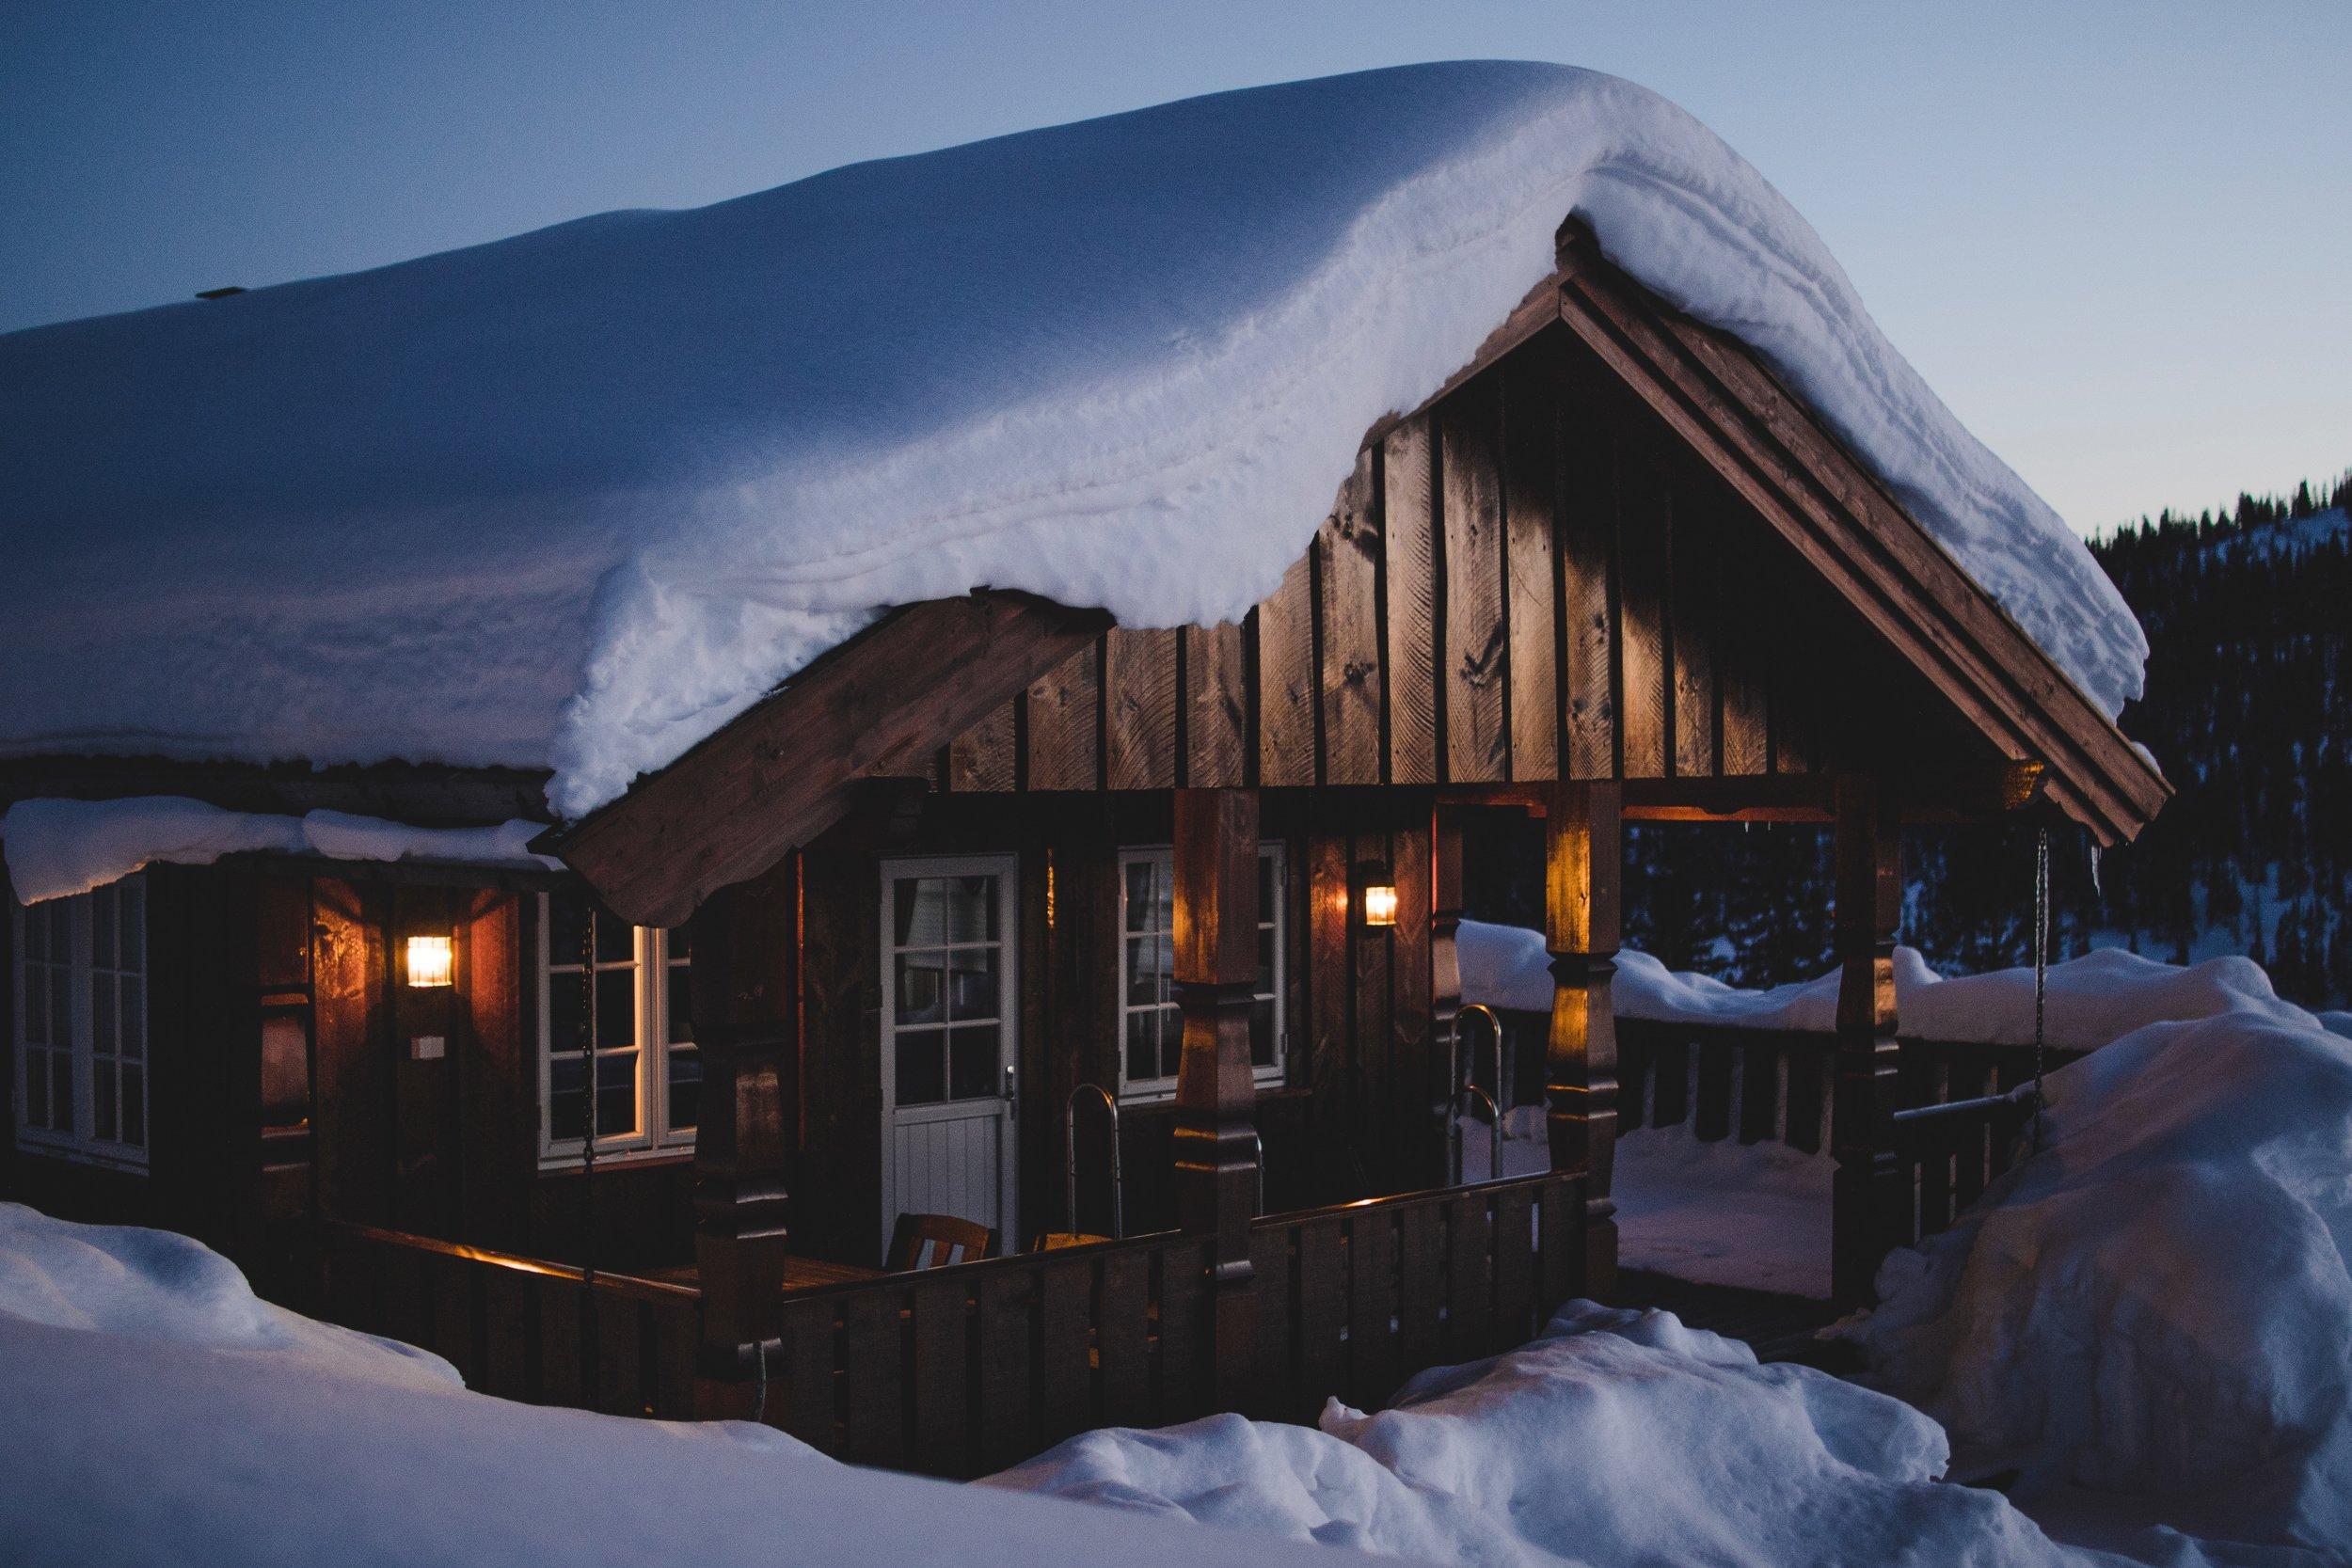 cabin-clouds-cold-950058.jpg